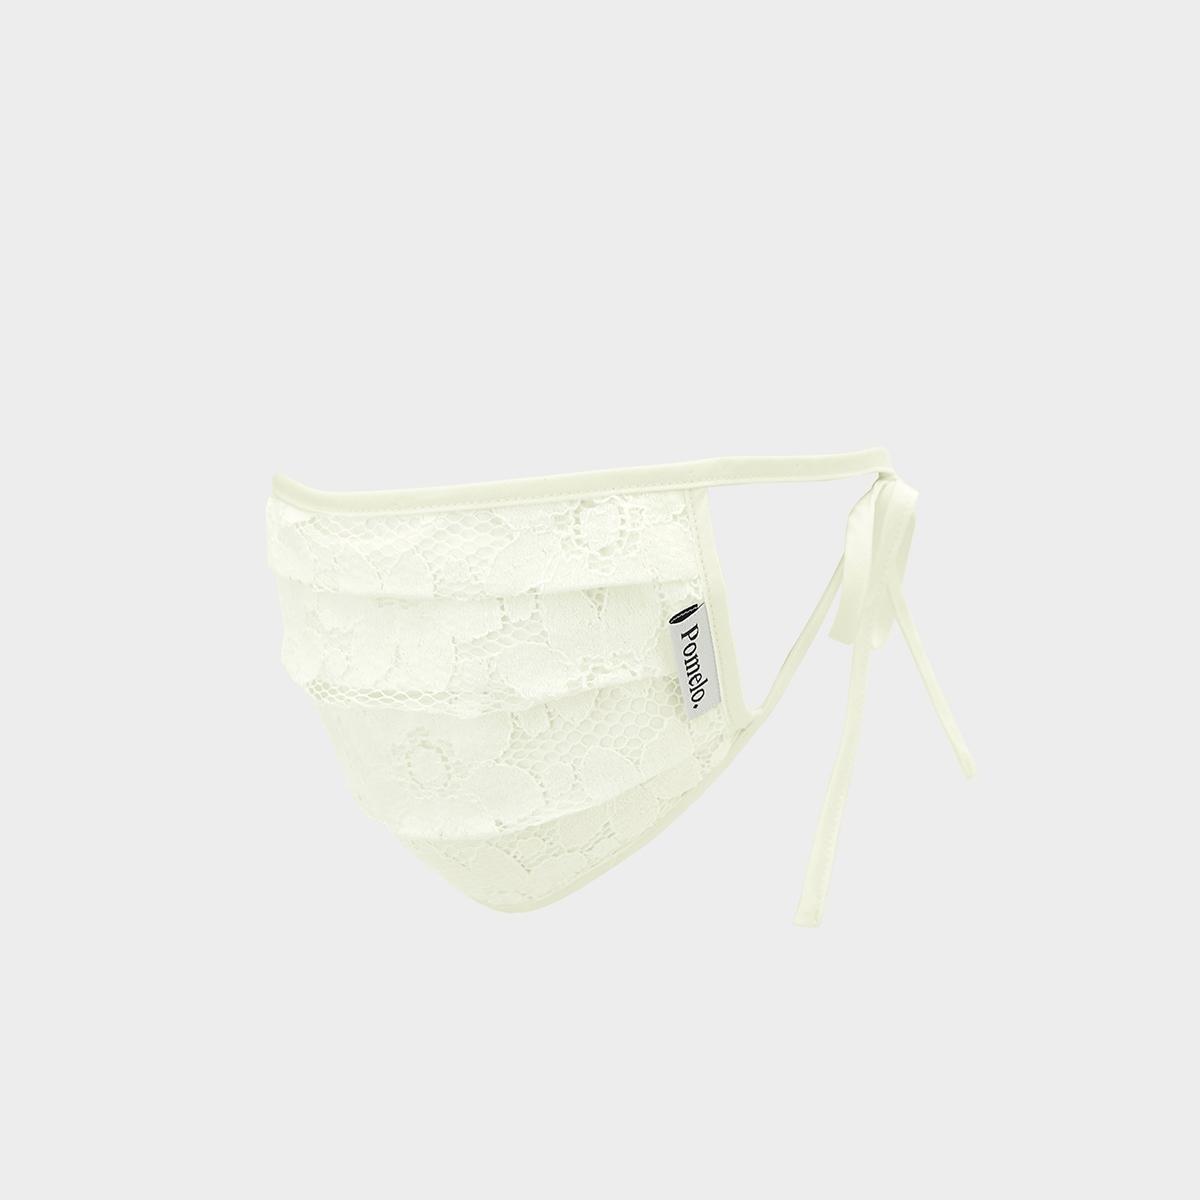 Reusable Lace Face Mask White